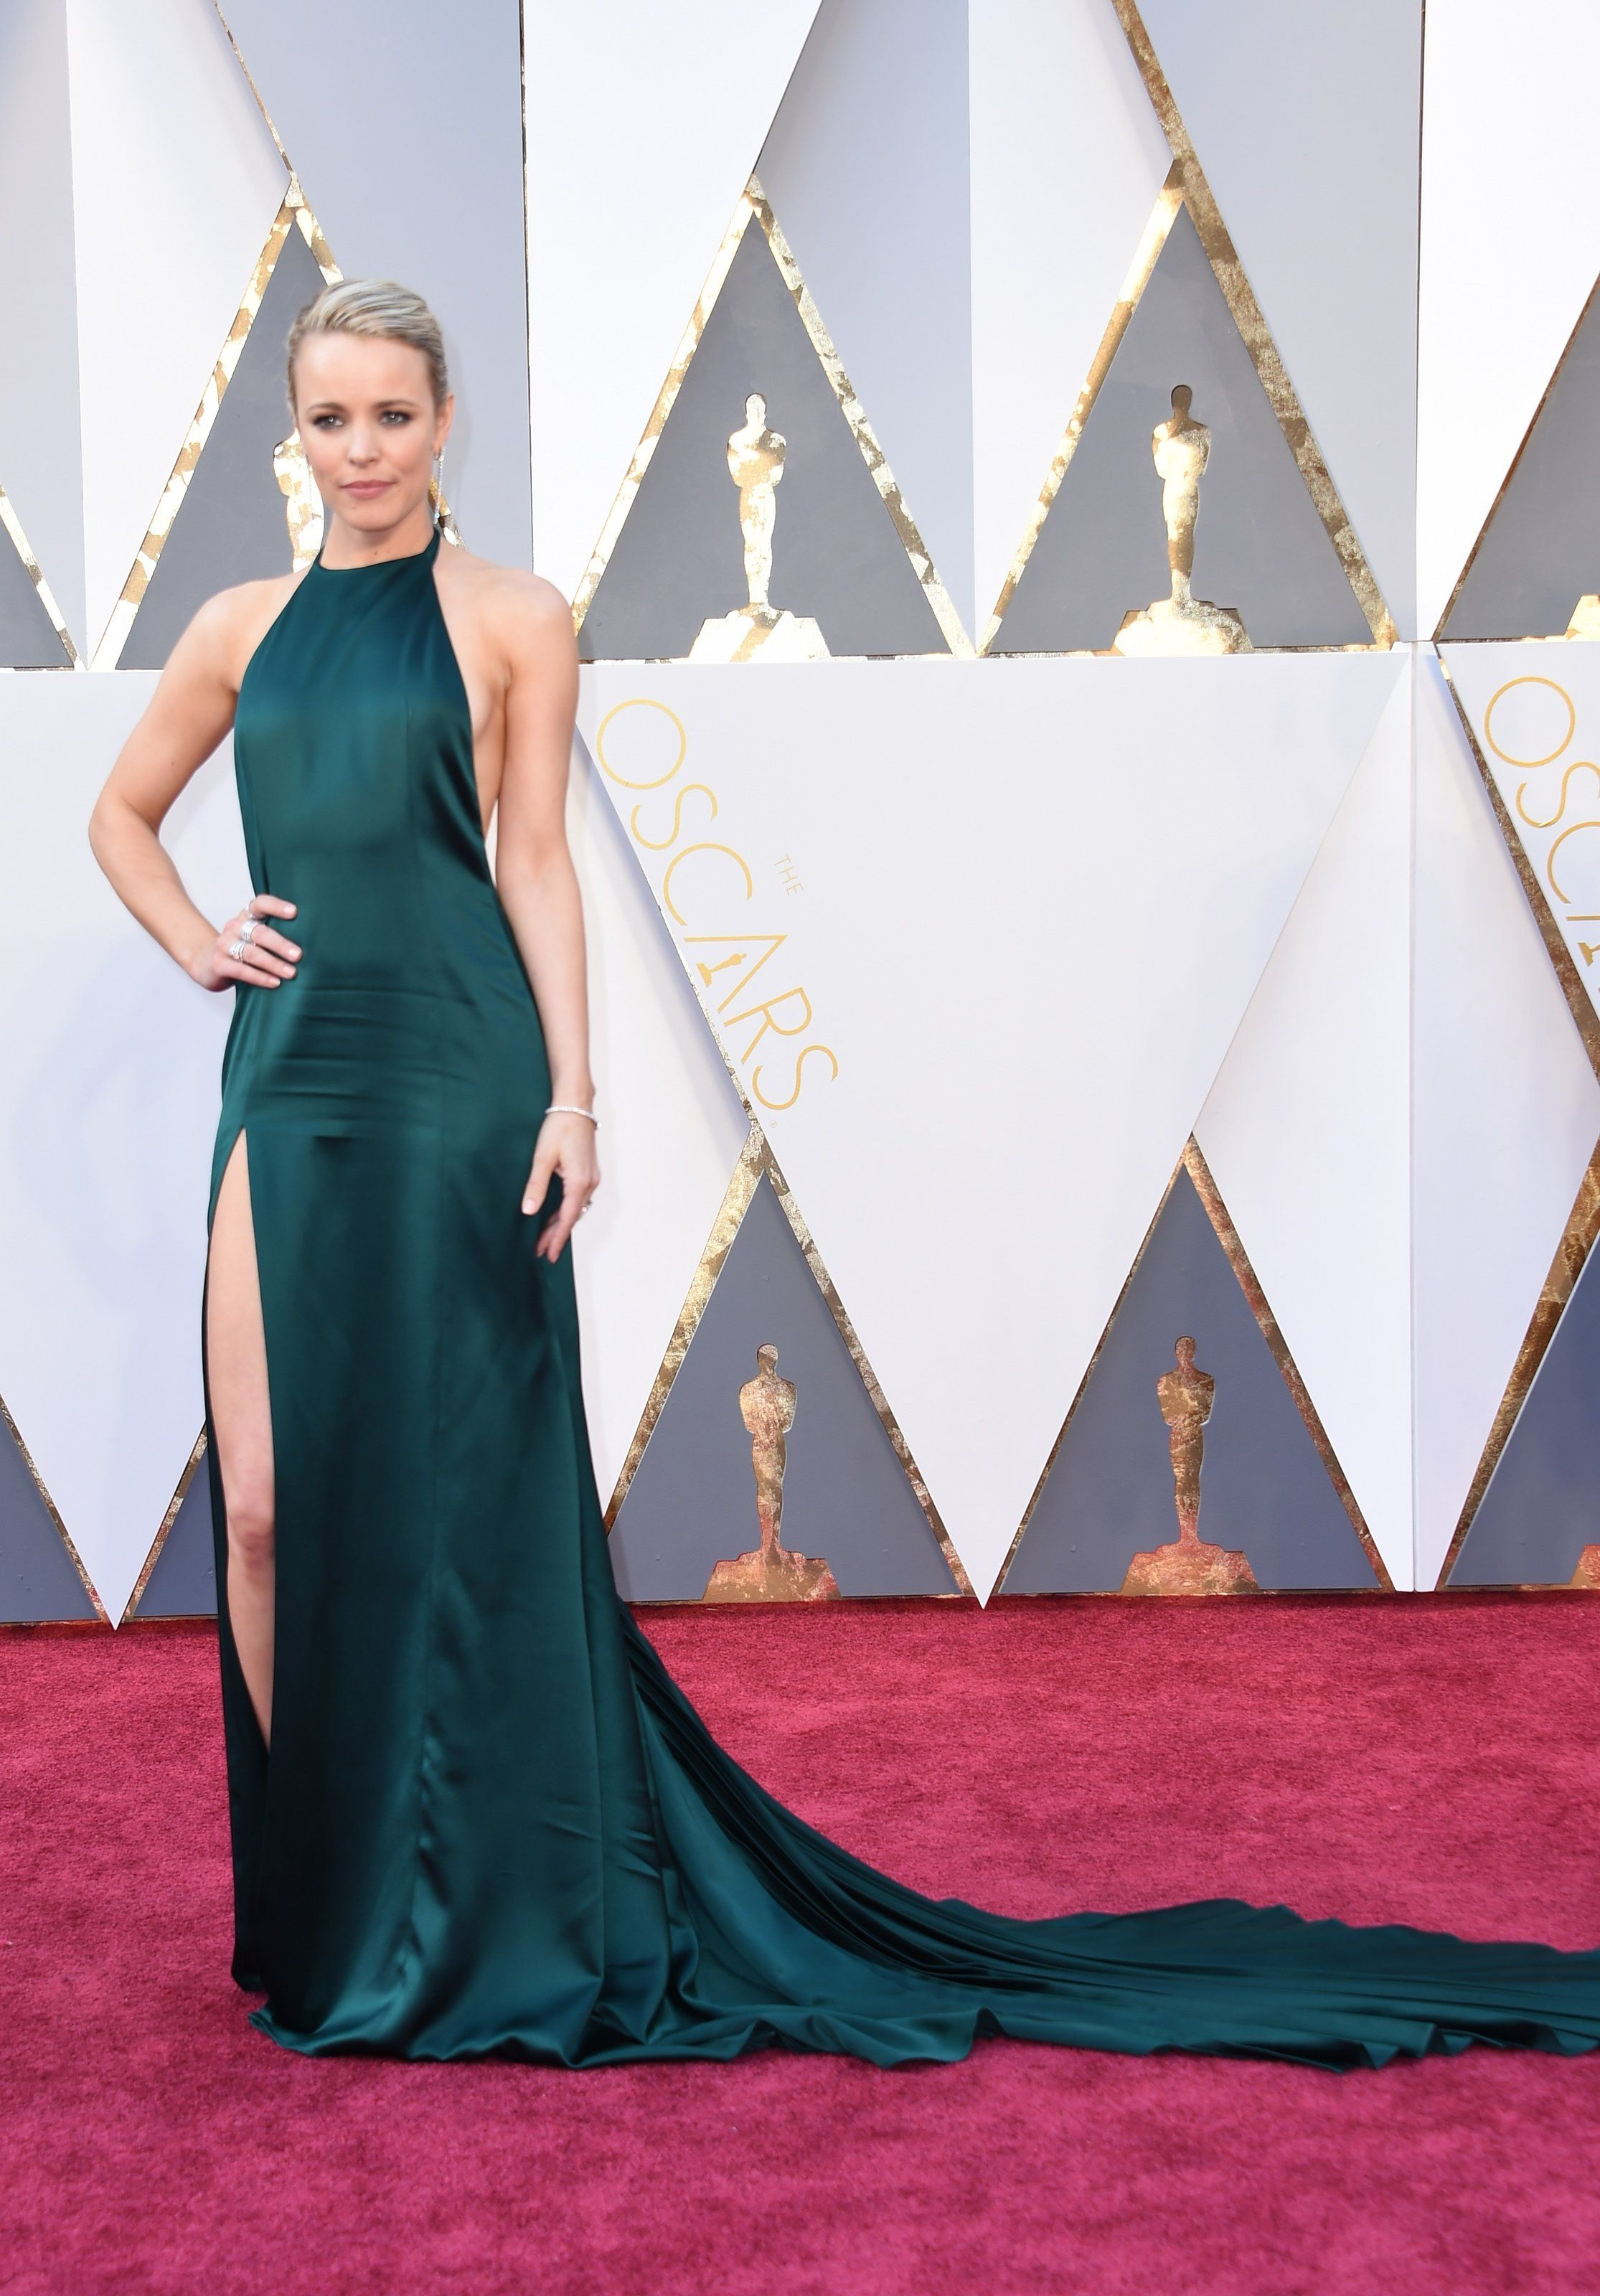 Oscars red carpet rachel mcadams in august getty atelier chic